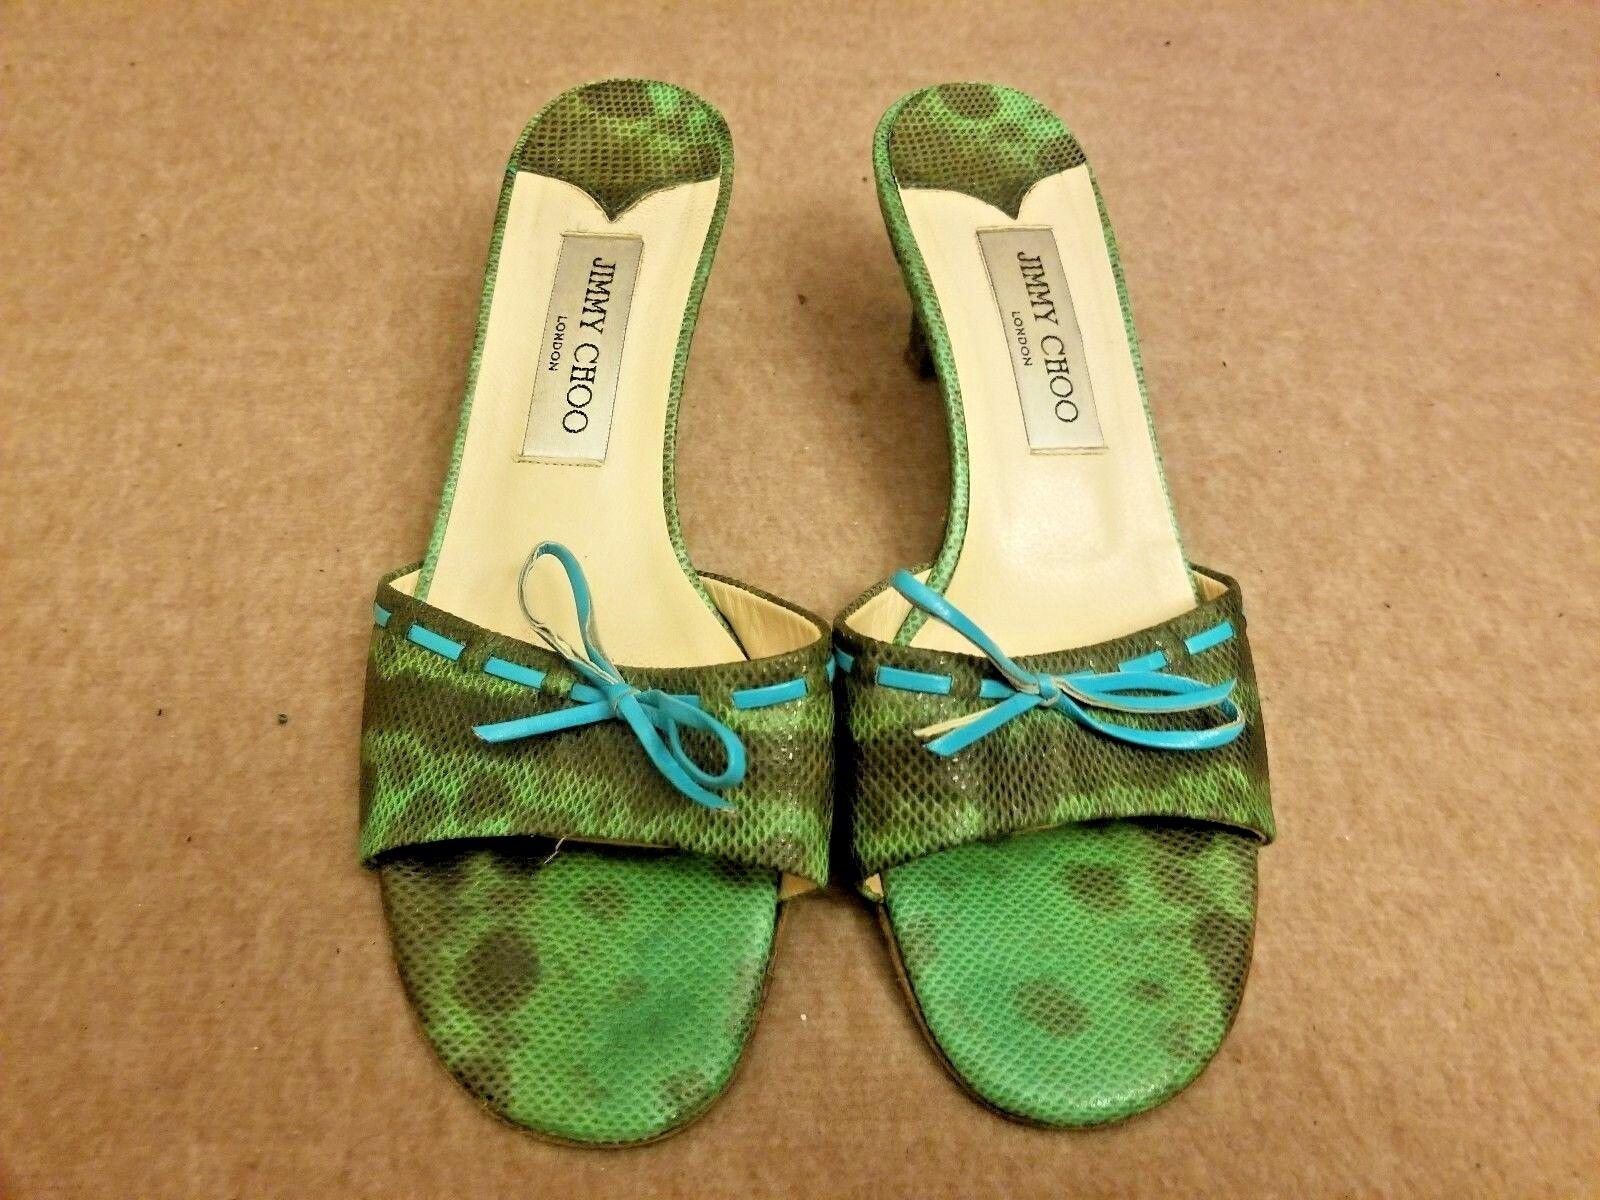 Jimmy Choo London Women Green Snake Print Bow Texture Heels Slides shoes Size 38